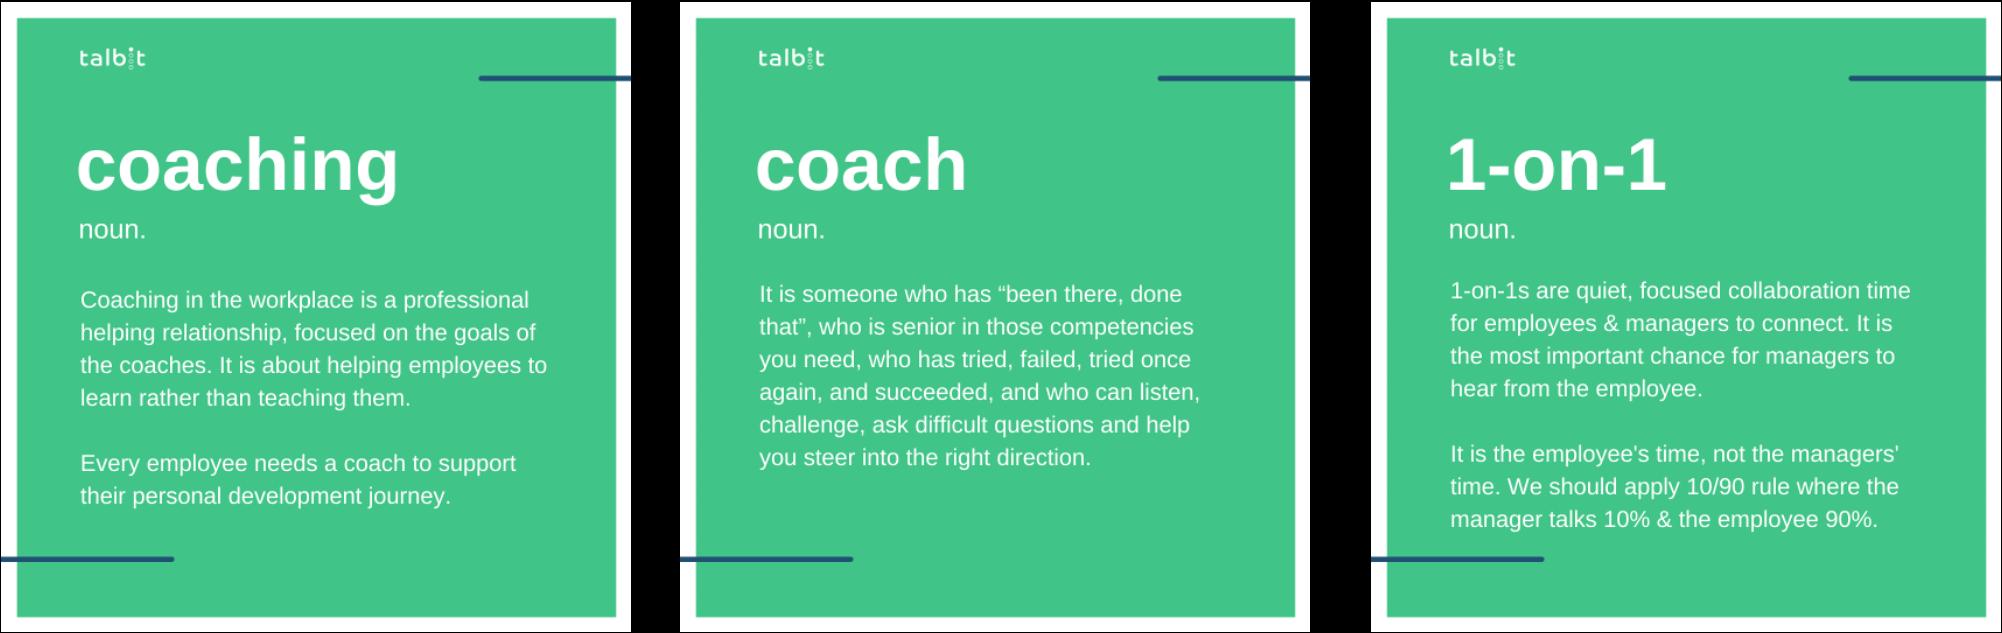 coaching 1-on-1s